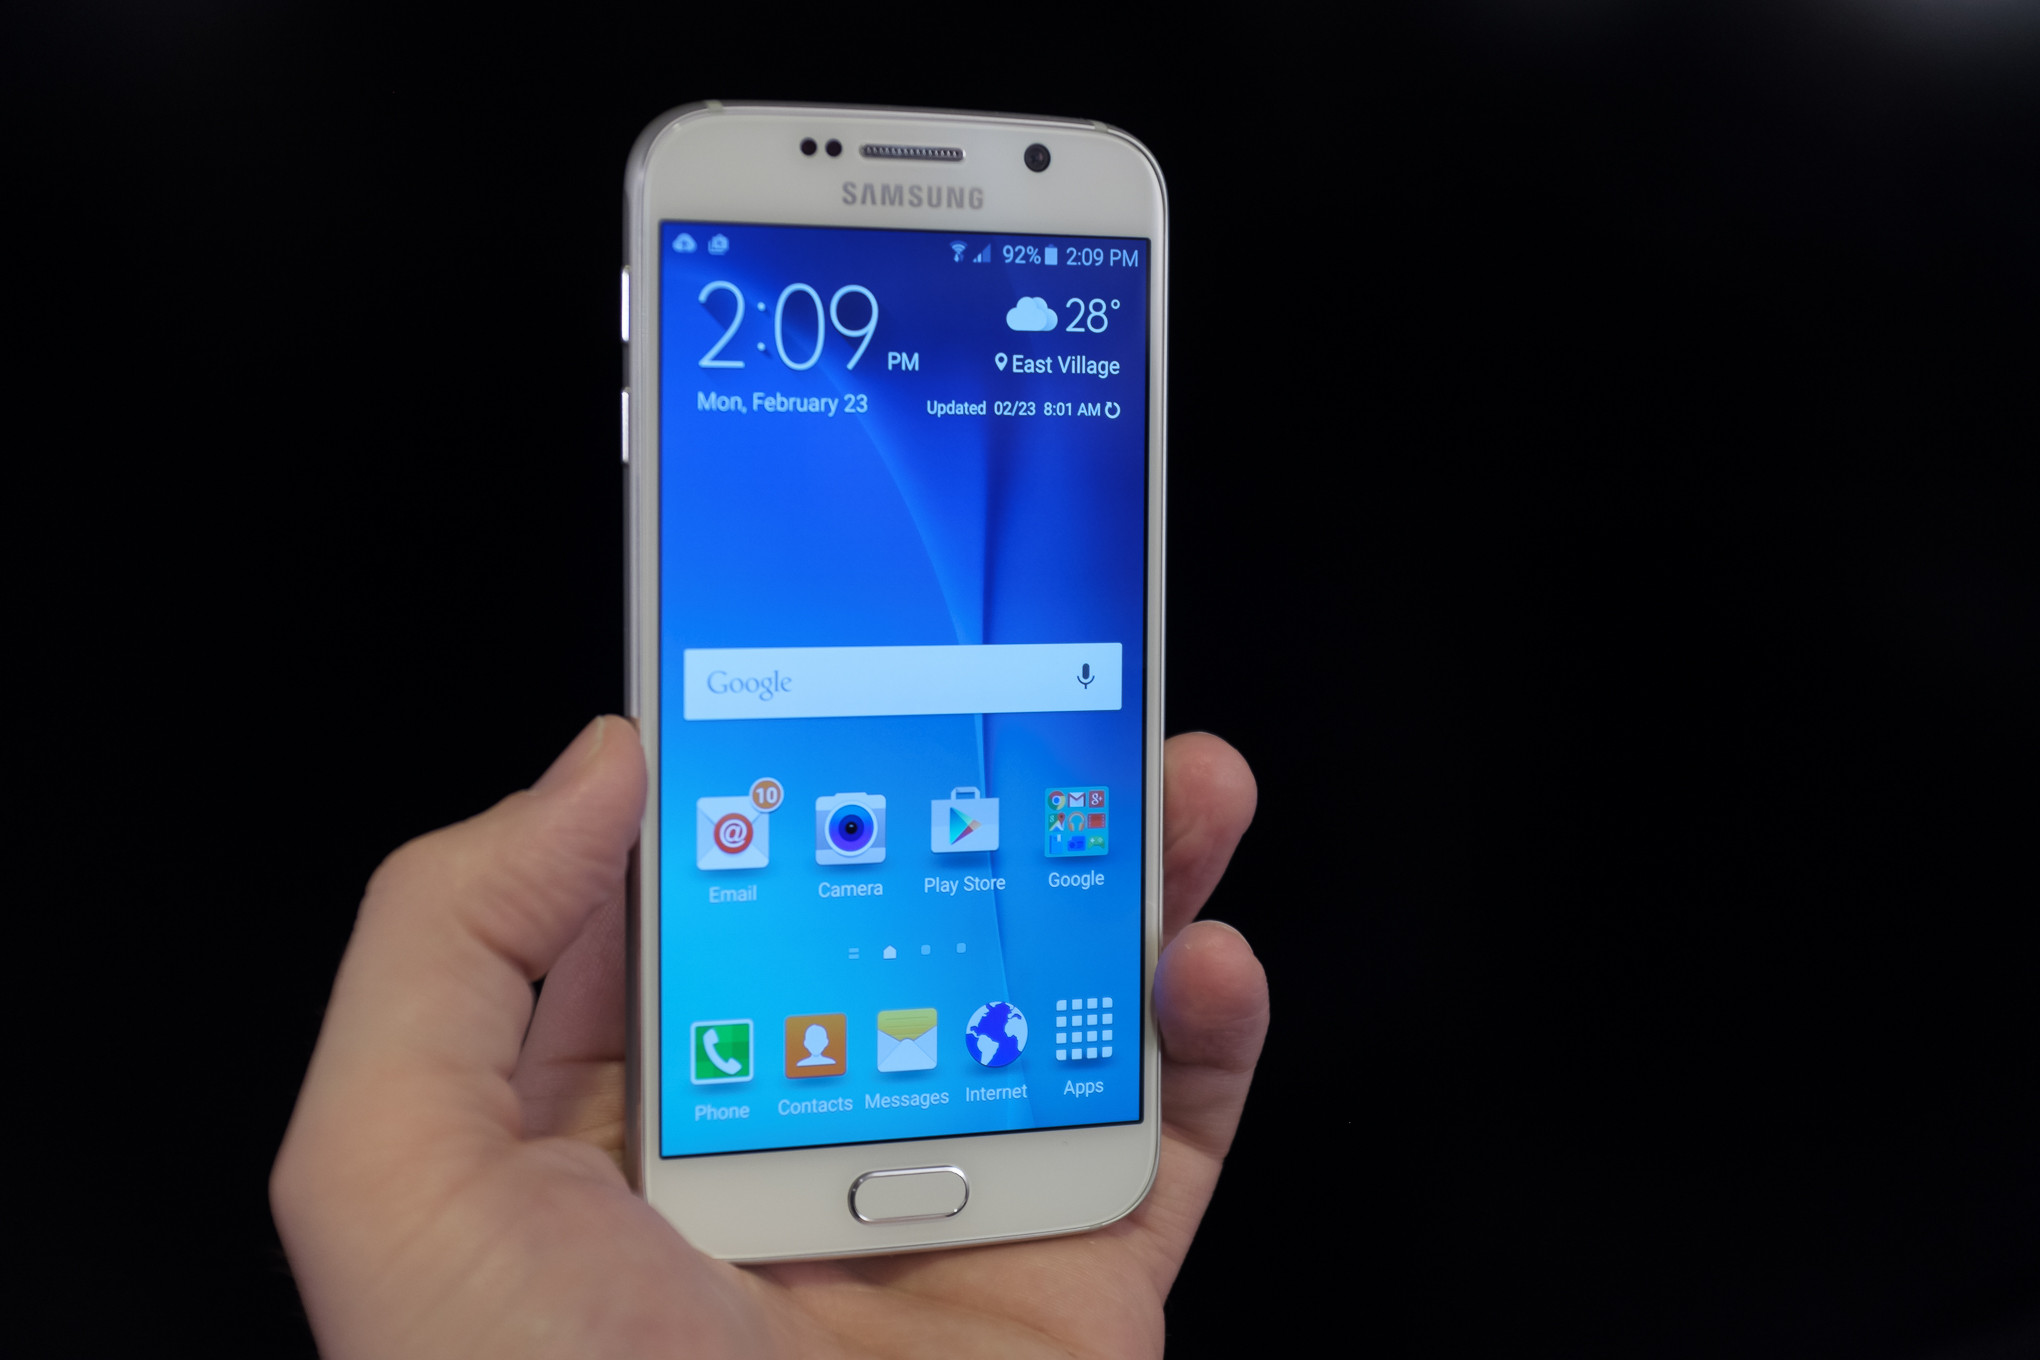 Samsung Galaxy S6 and S6 Edge photos